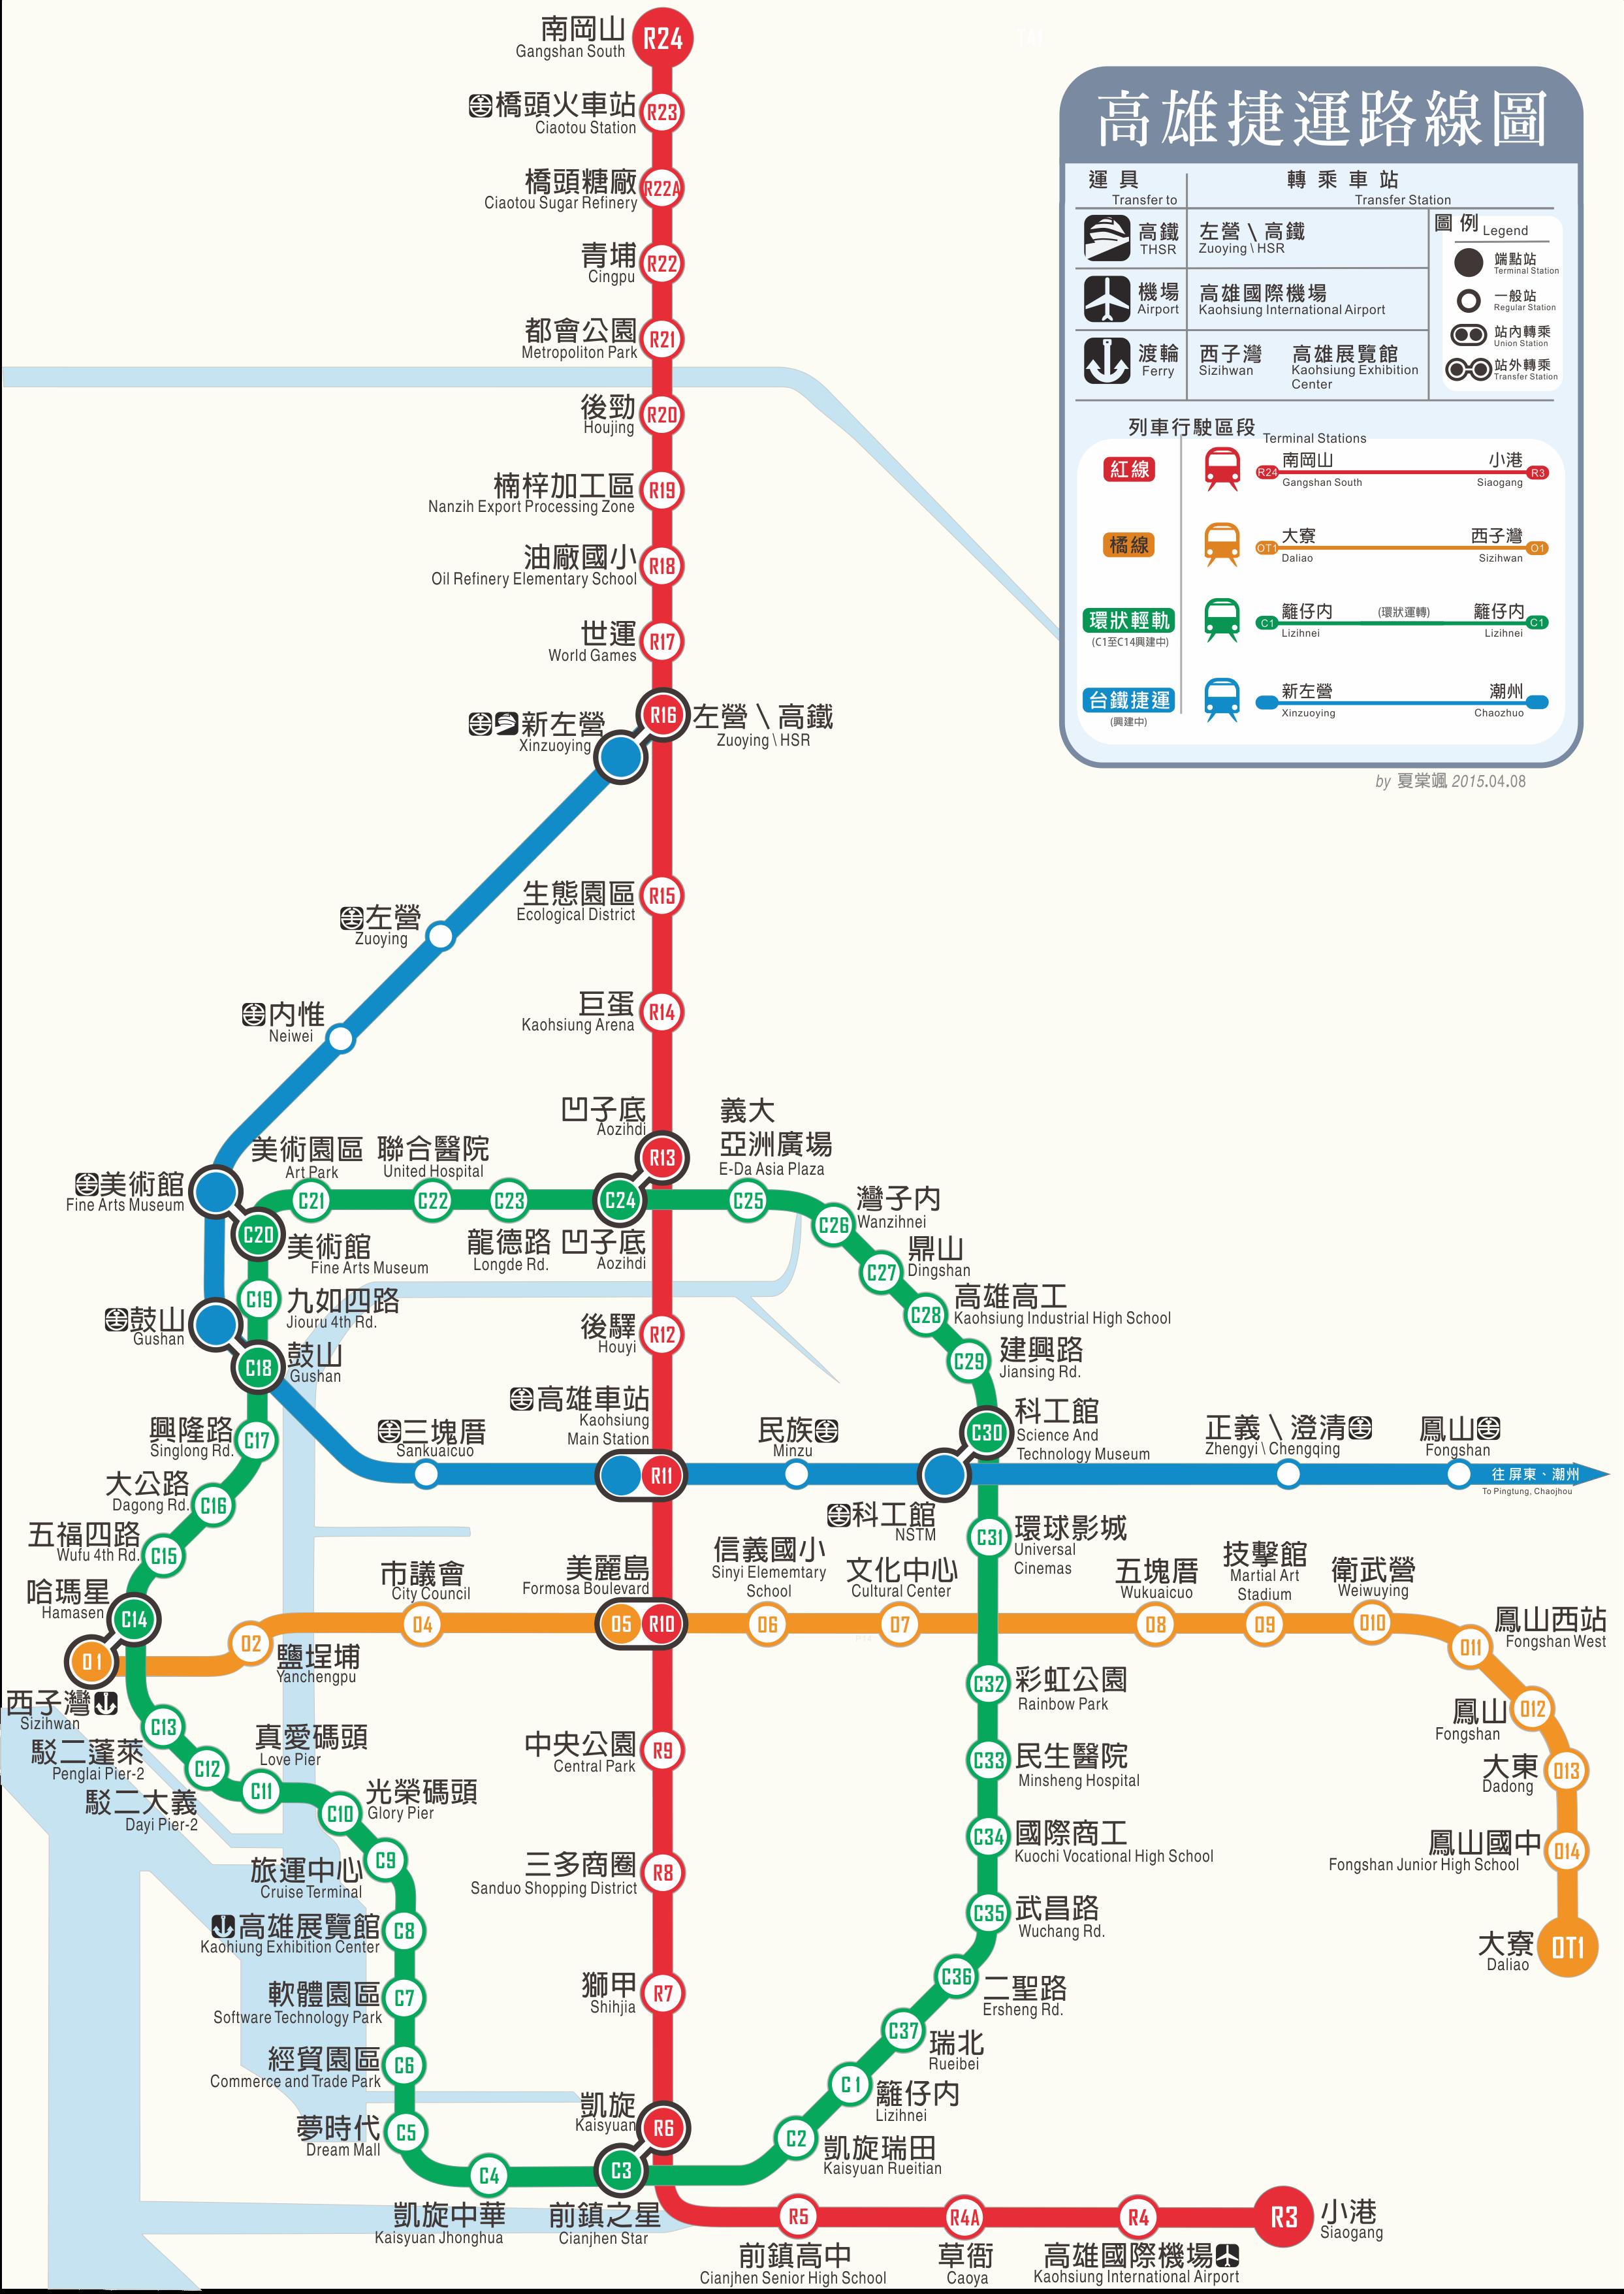 KRTS Map 高雄捷運路網圖